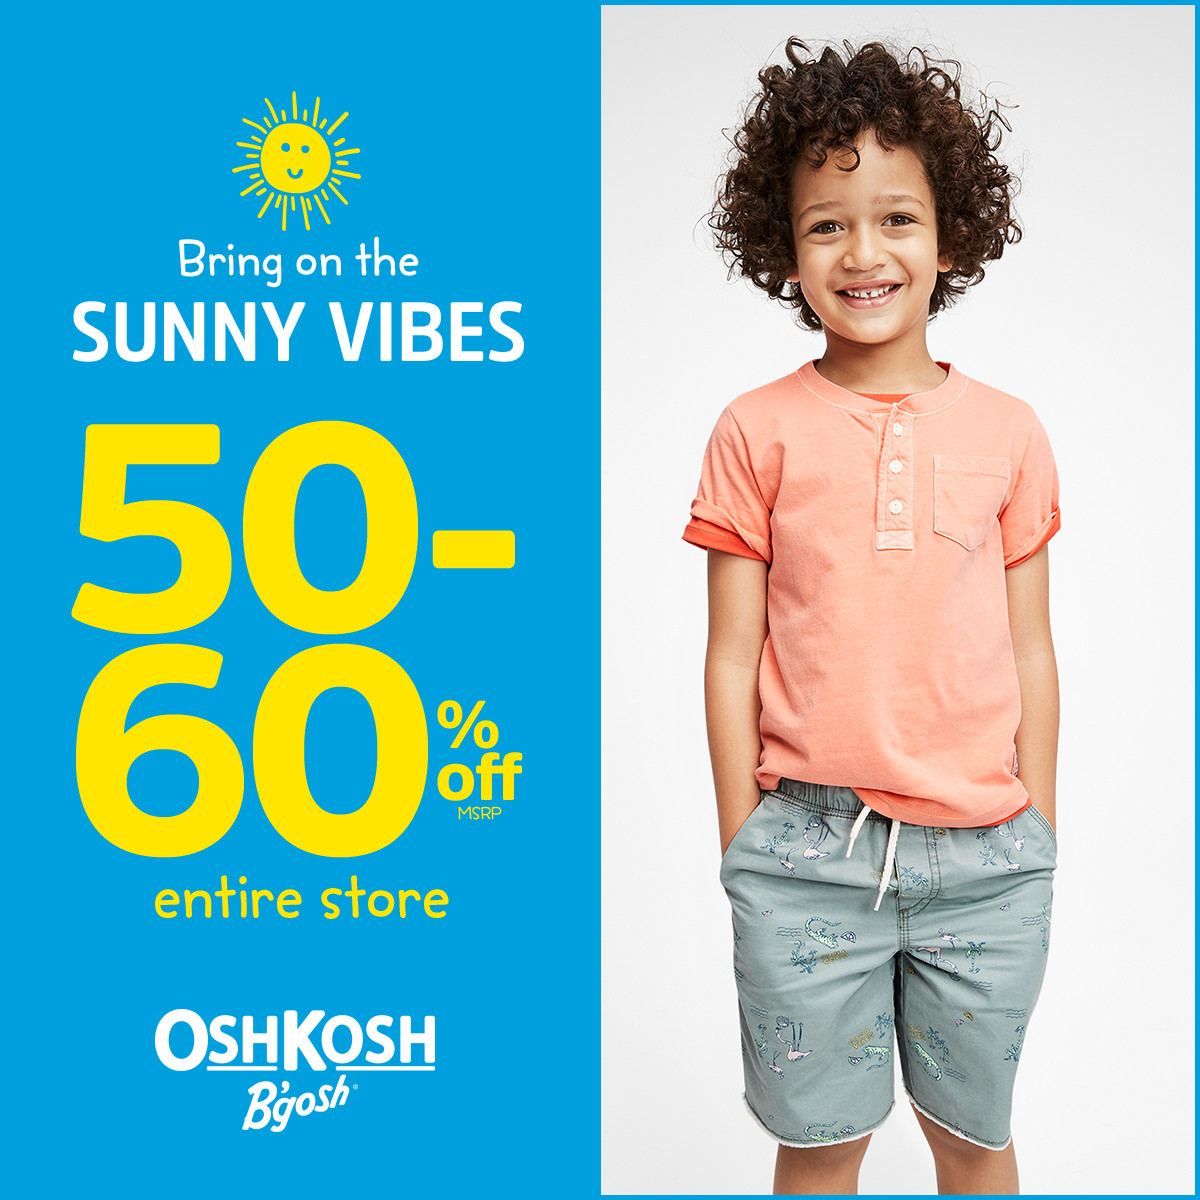 50-60% Off* Entire Store at OshKosh